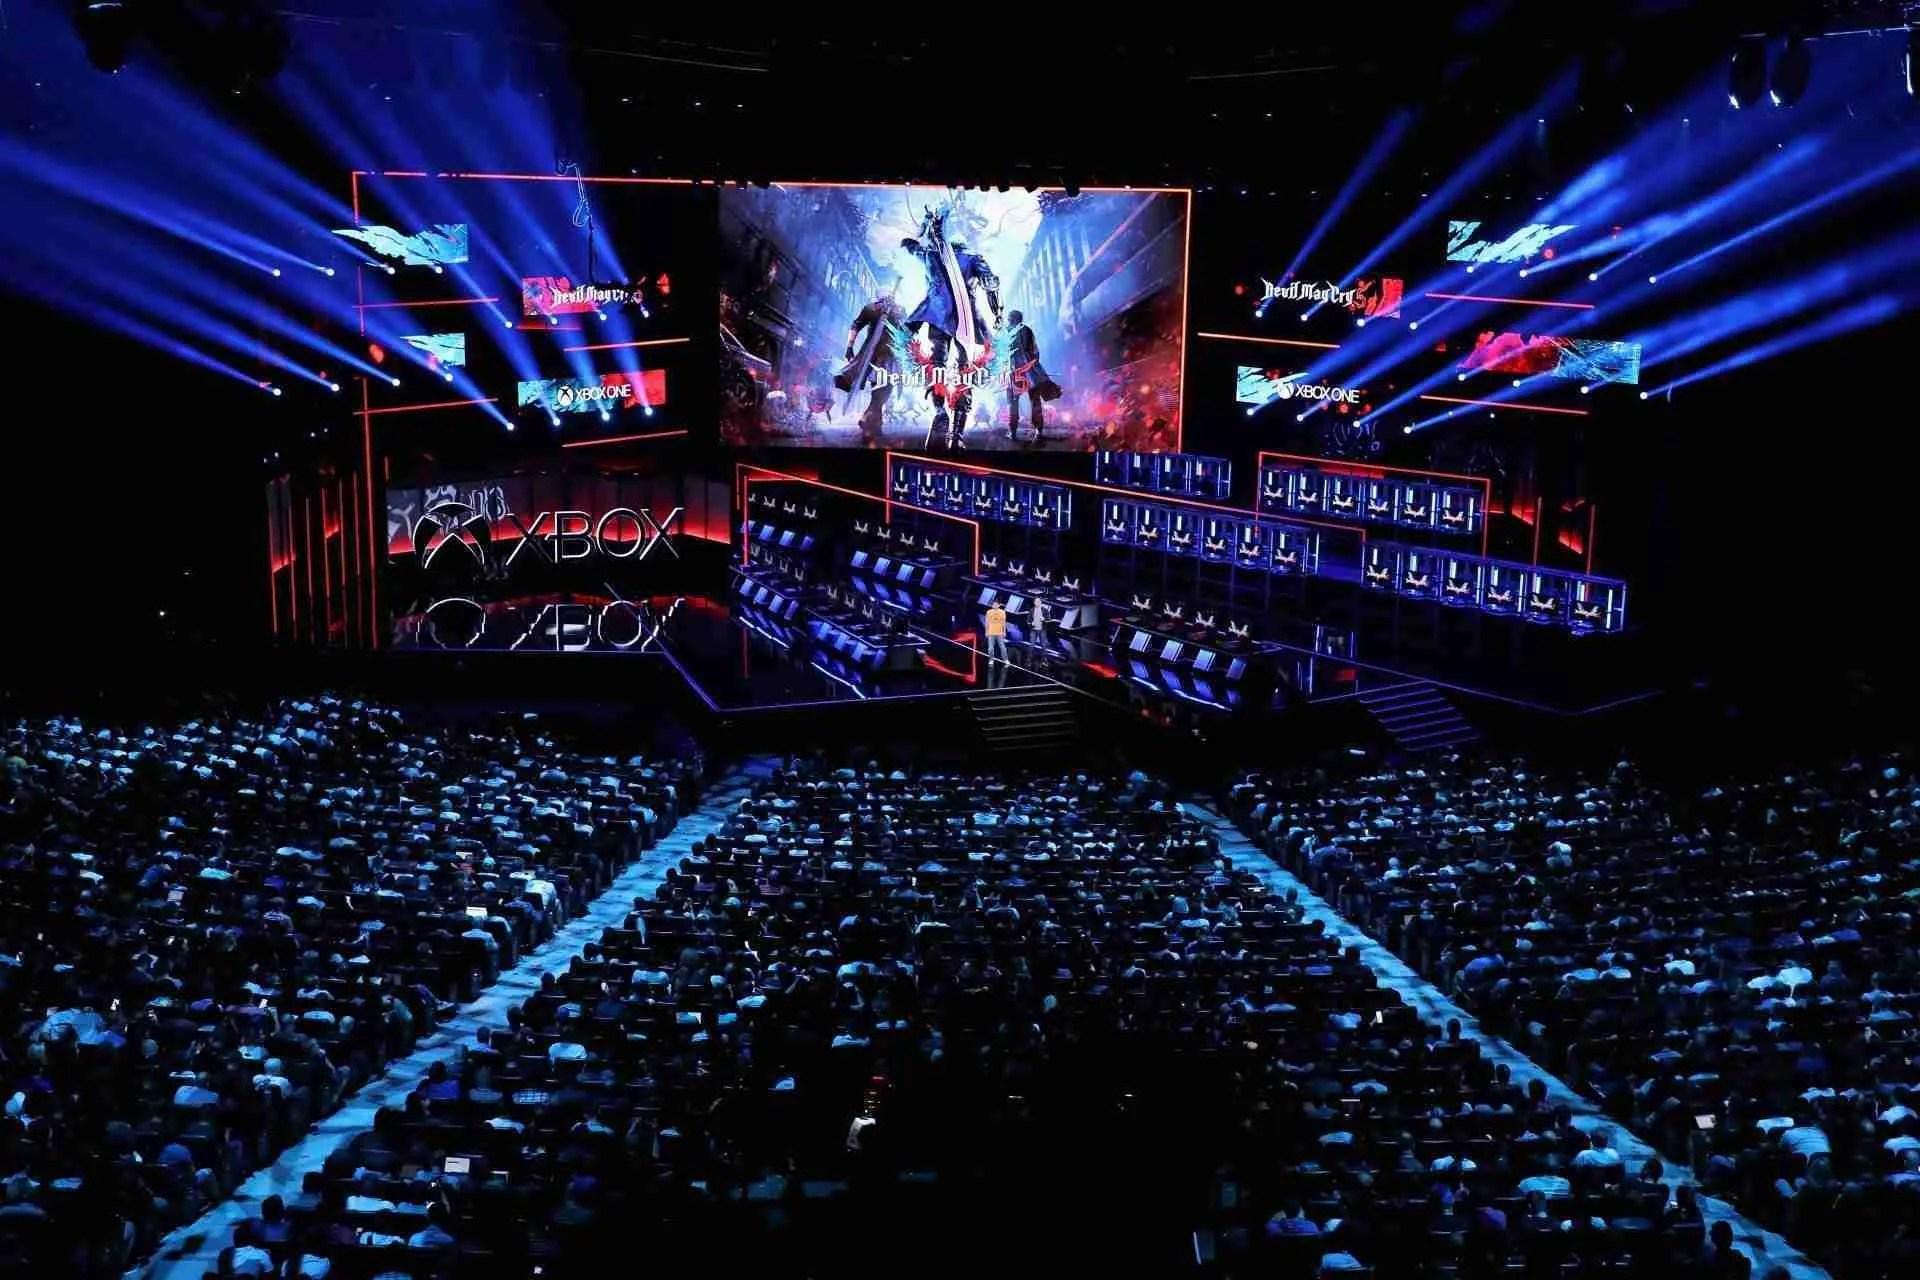 Devil May Cry 5 E3